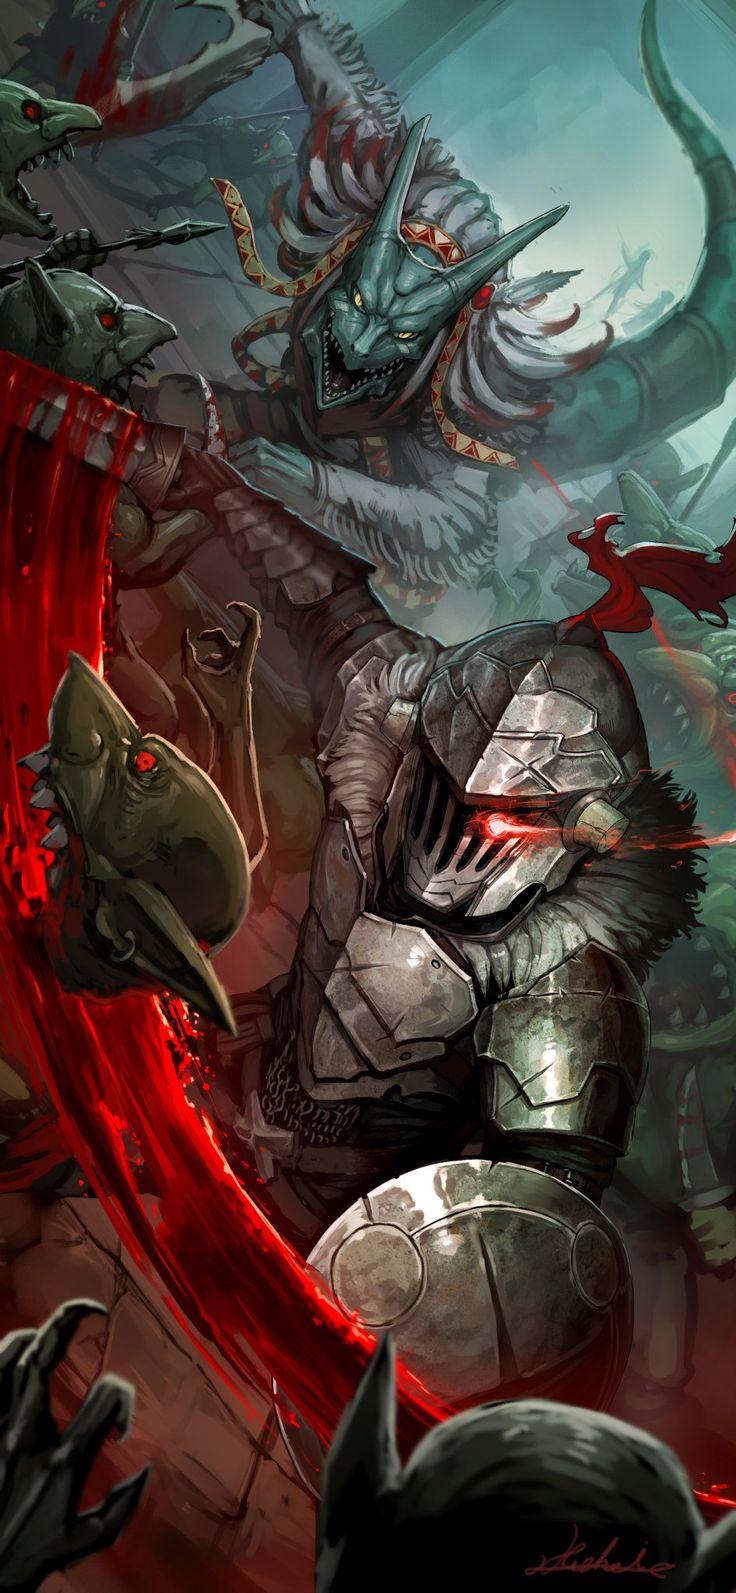 羽山 晃平 on Slayer anime, Anime, Goblin